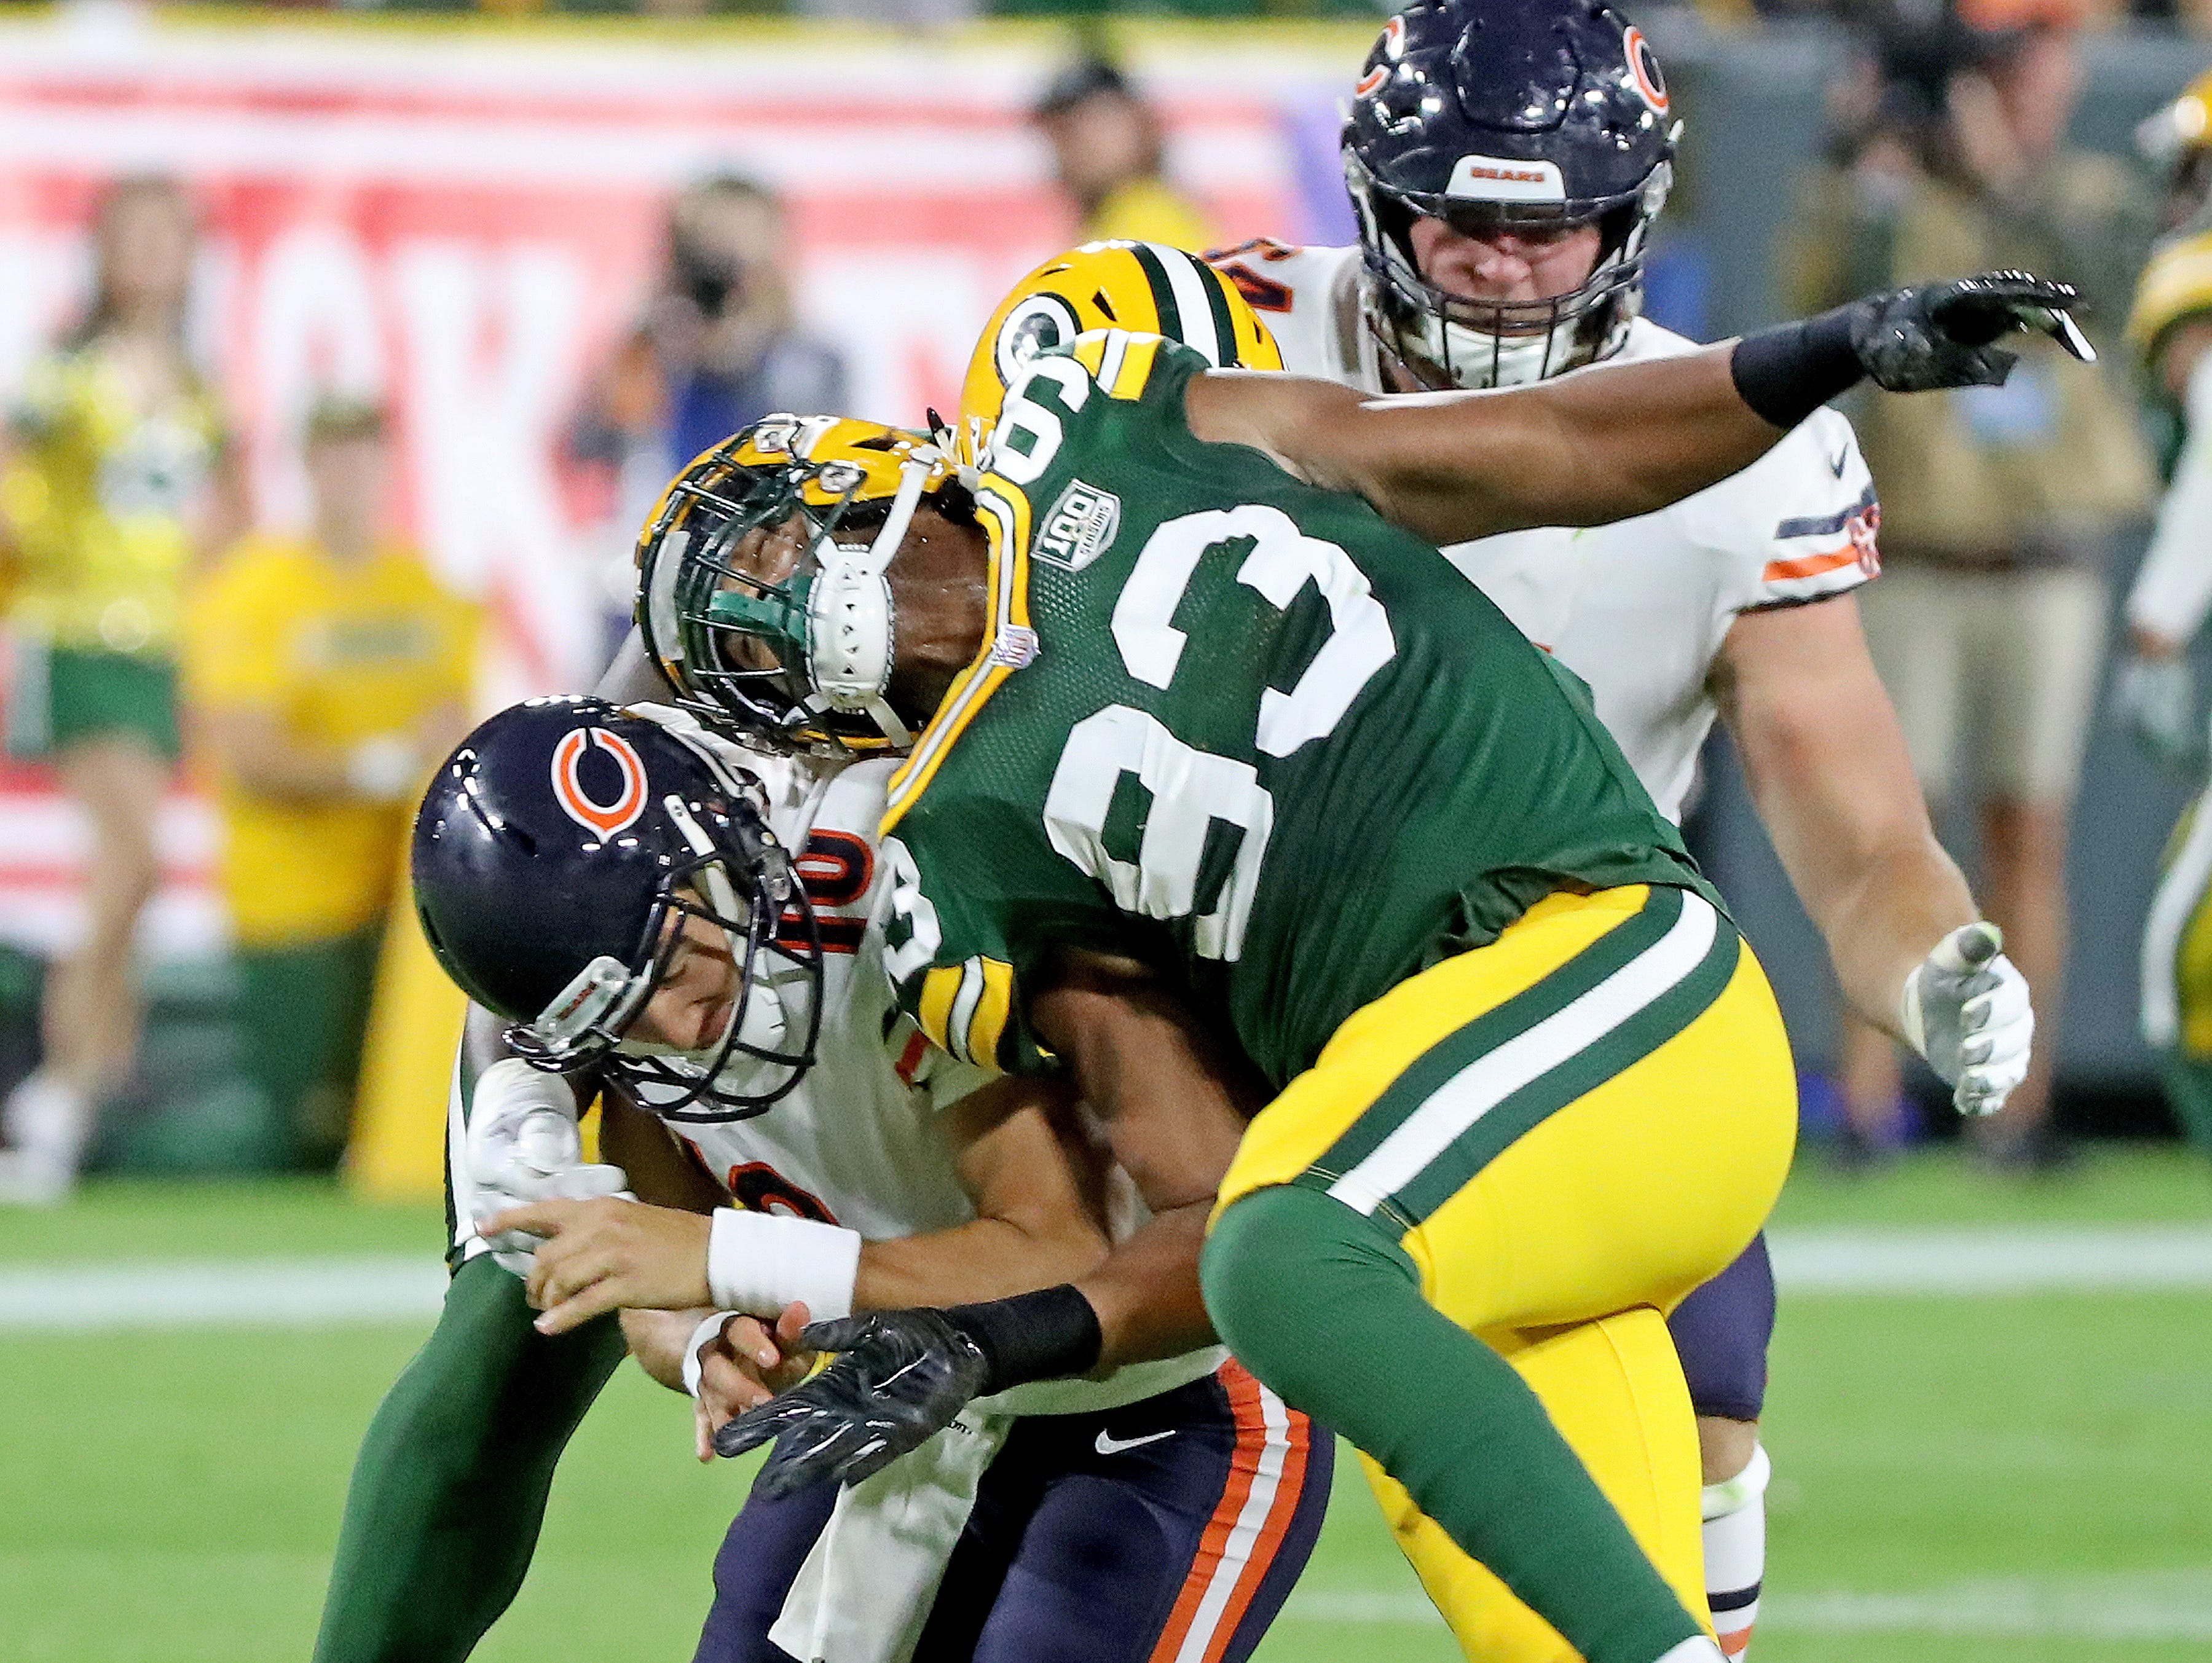 Green Bay Packers linebacker Reggie Gilbert (93) hits quarterback Mitchell Trubisky (10) against the Chicago Bears Sunday, September 9, 2018 at Lambeau Field in Green Bay, Wis. Jim Matthews/USA TODAY NETWORK-Wisconsin